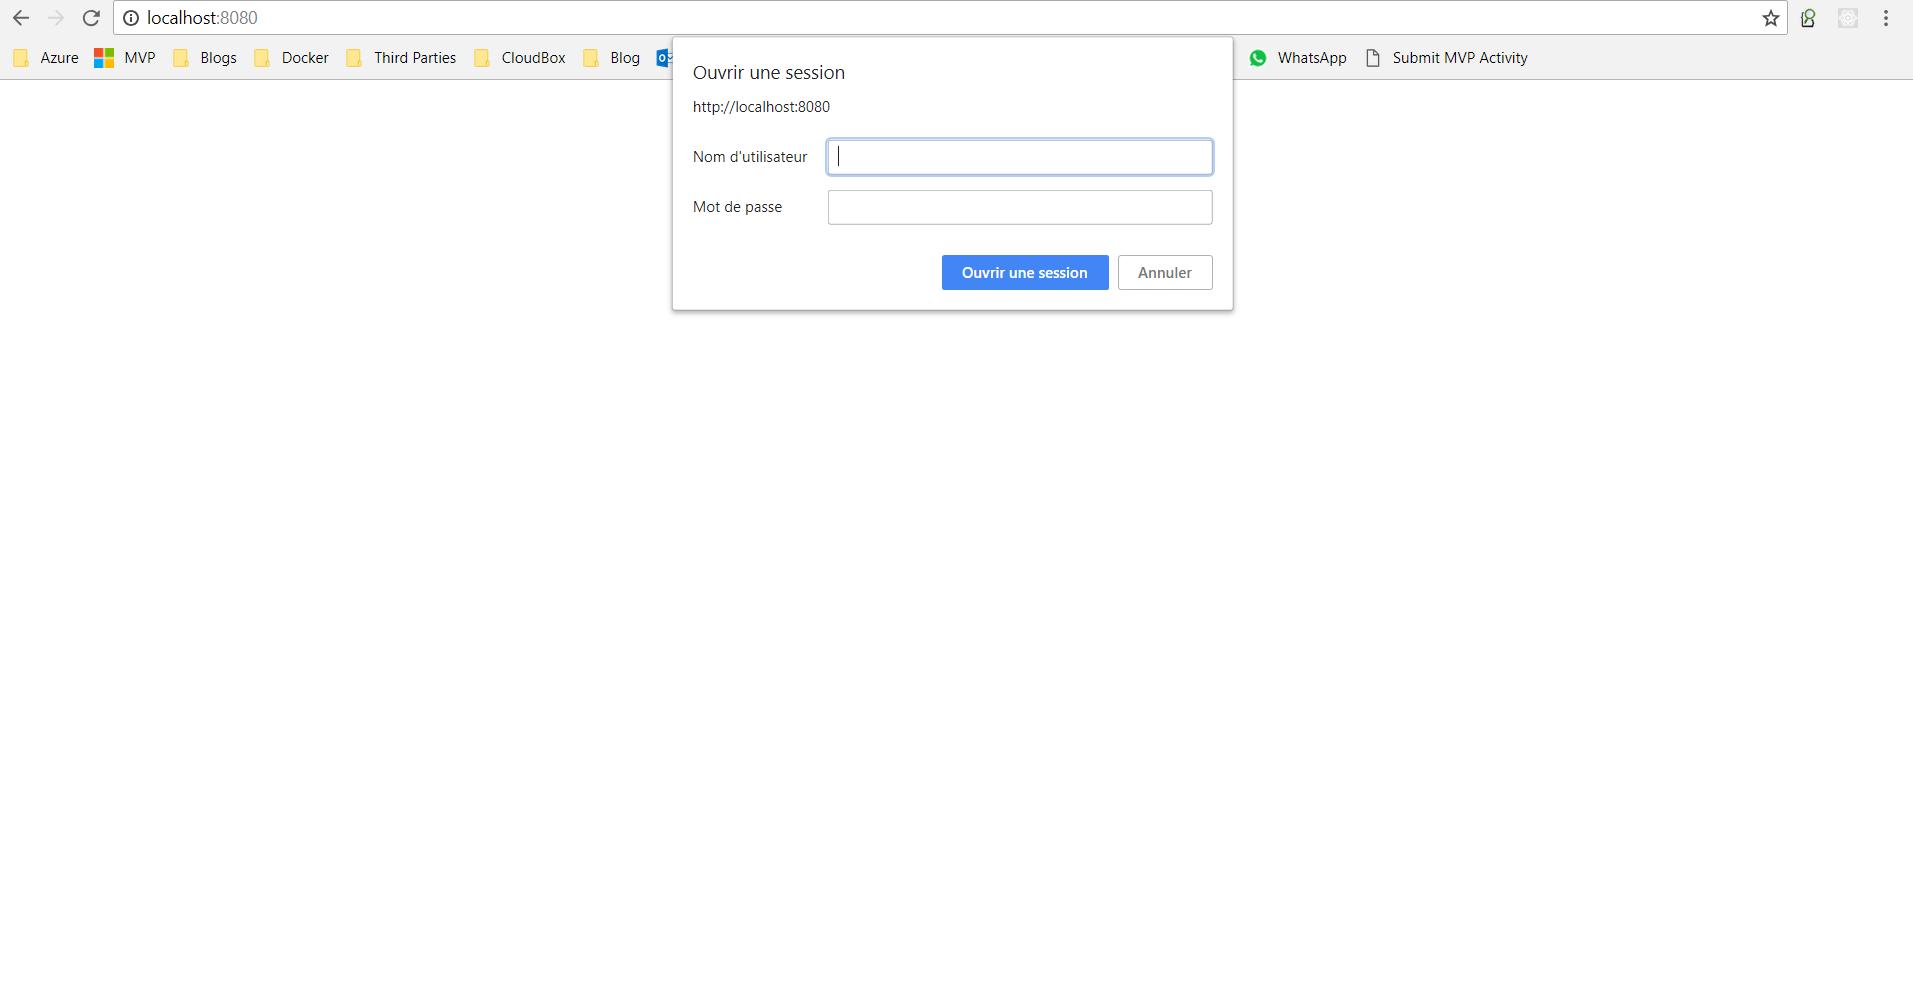 Créer un serveur de log avec Docker, Elastic Search, Kibana et Nginx